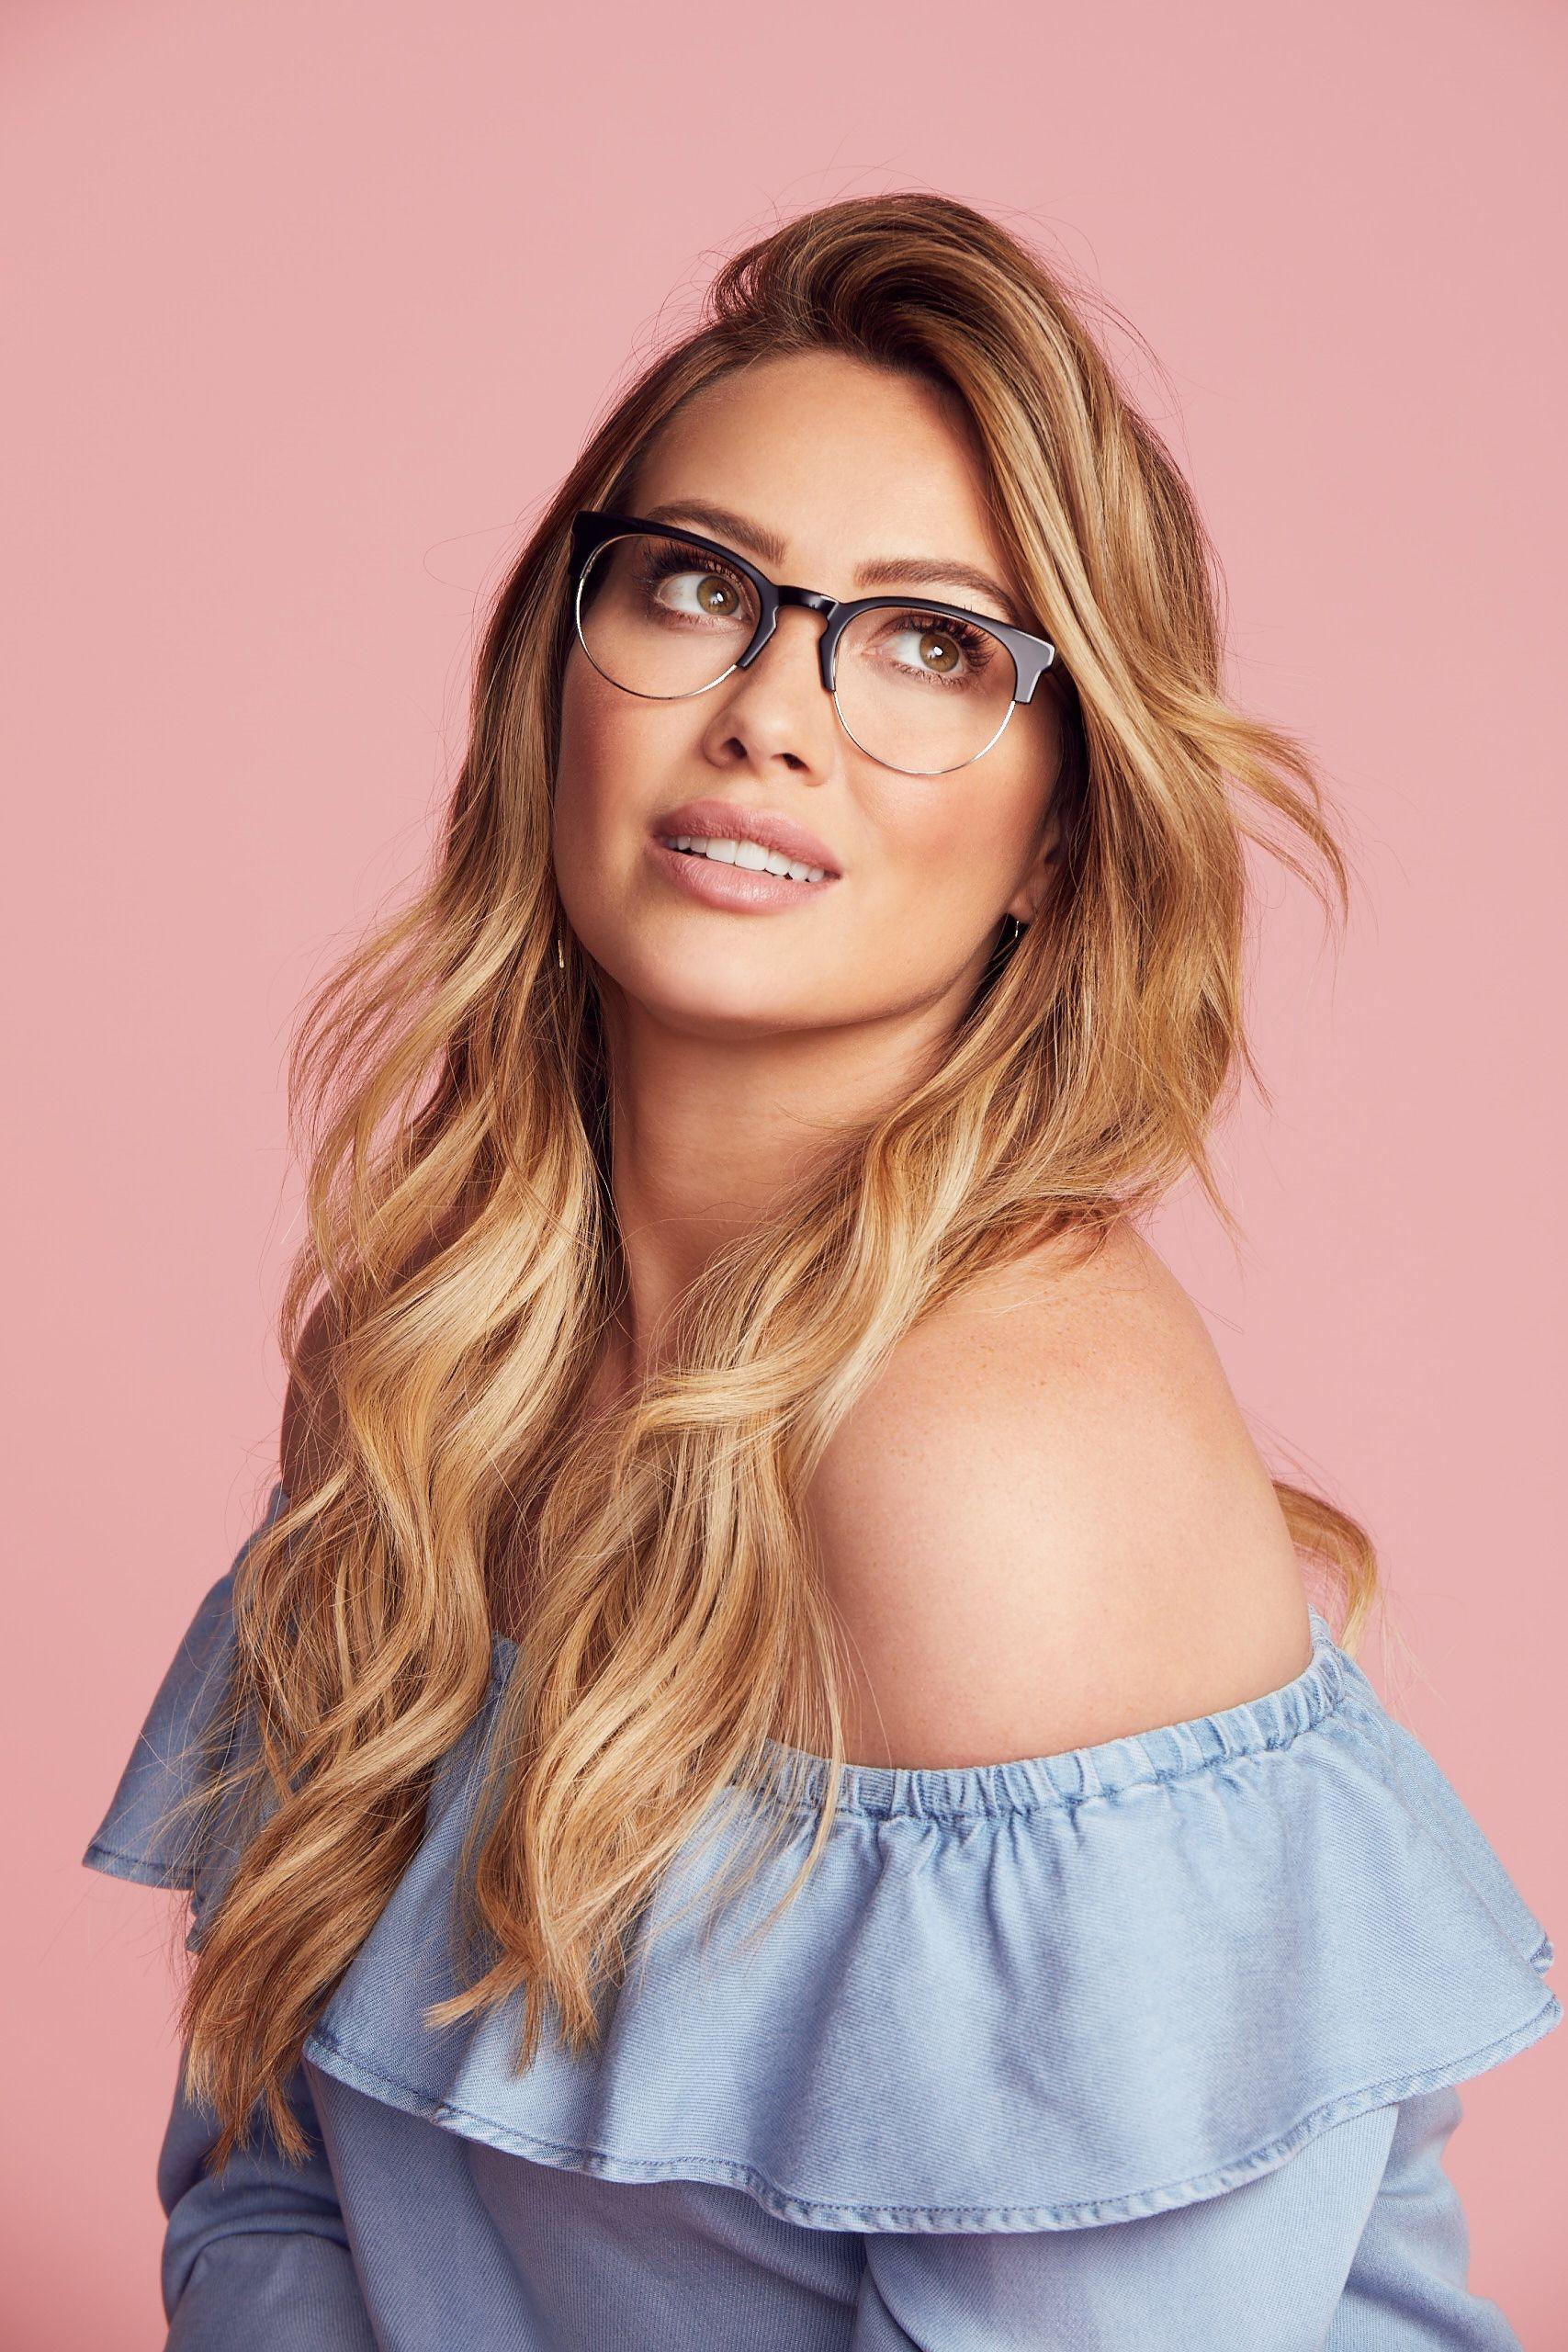 786ee8c3976 Hilary Duff Muse Henrietta Eyeglasses Online in 2019